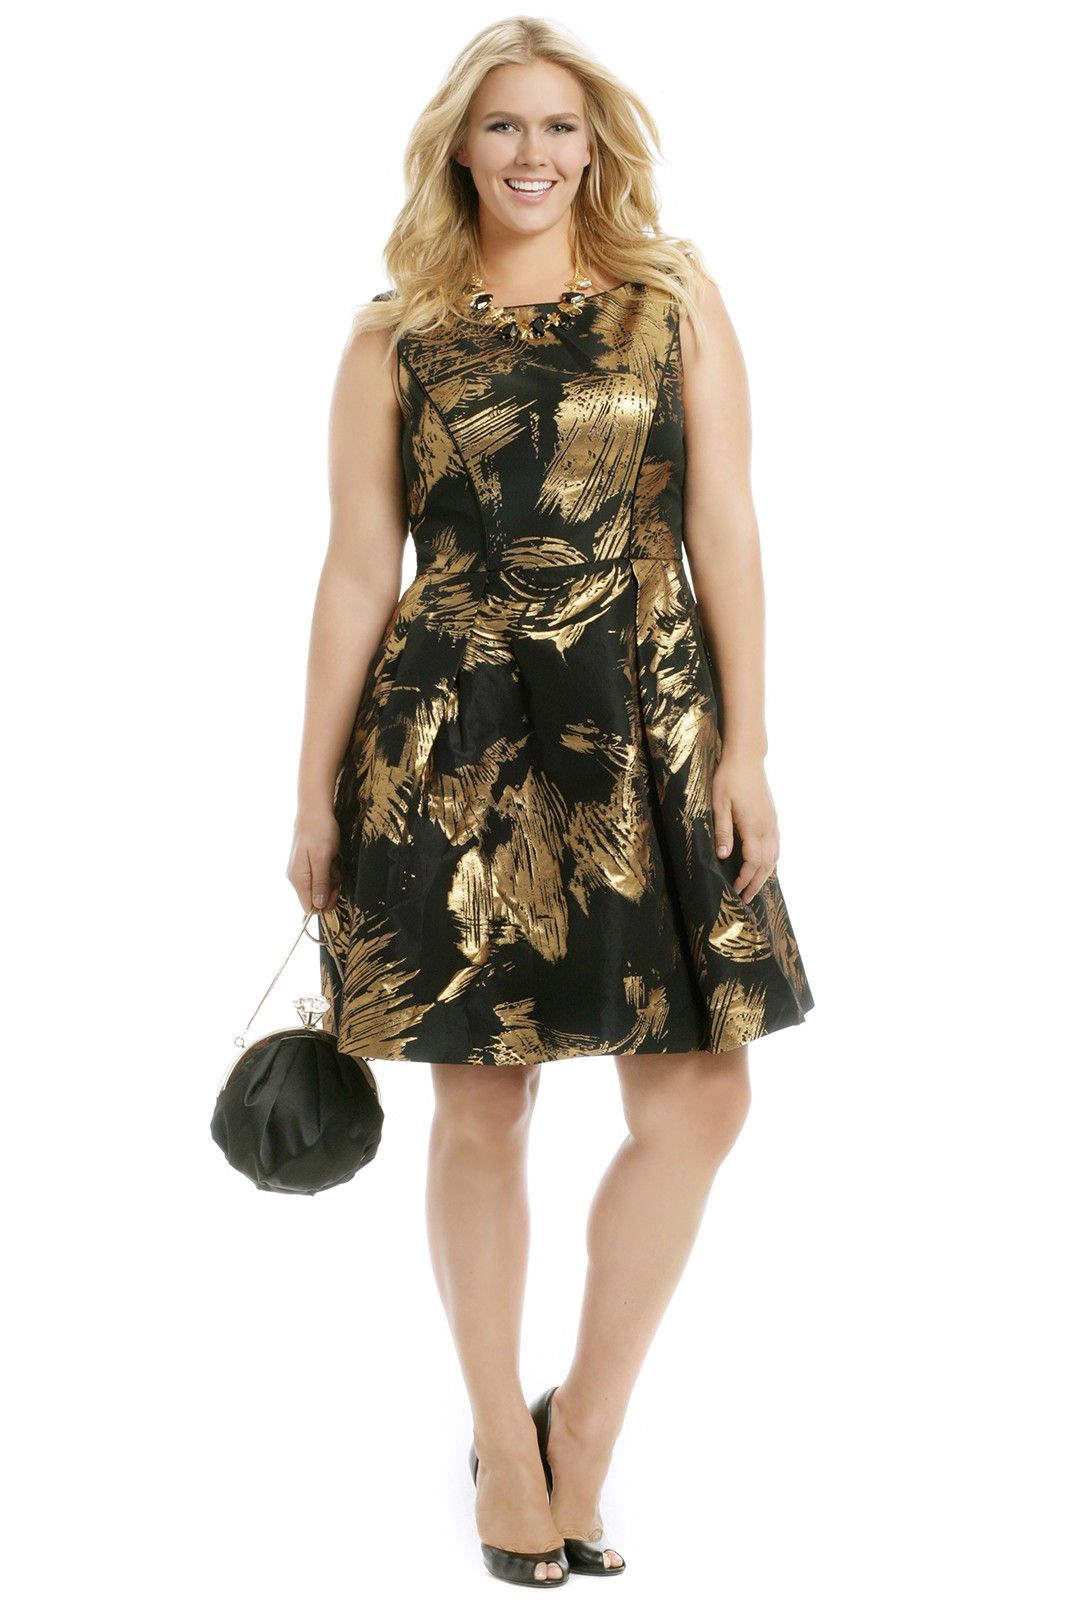 Plus size wedding dress rental  Rent The Runway Plus Size  Formal Wear For Curvy Women  Renting